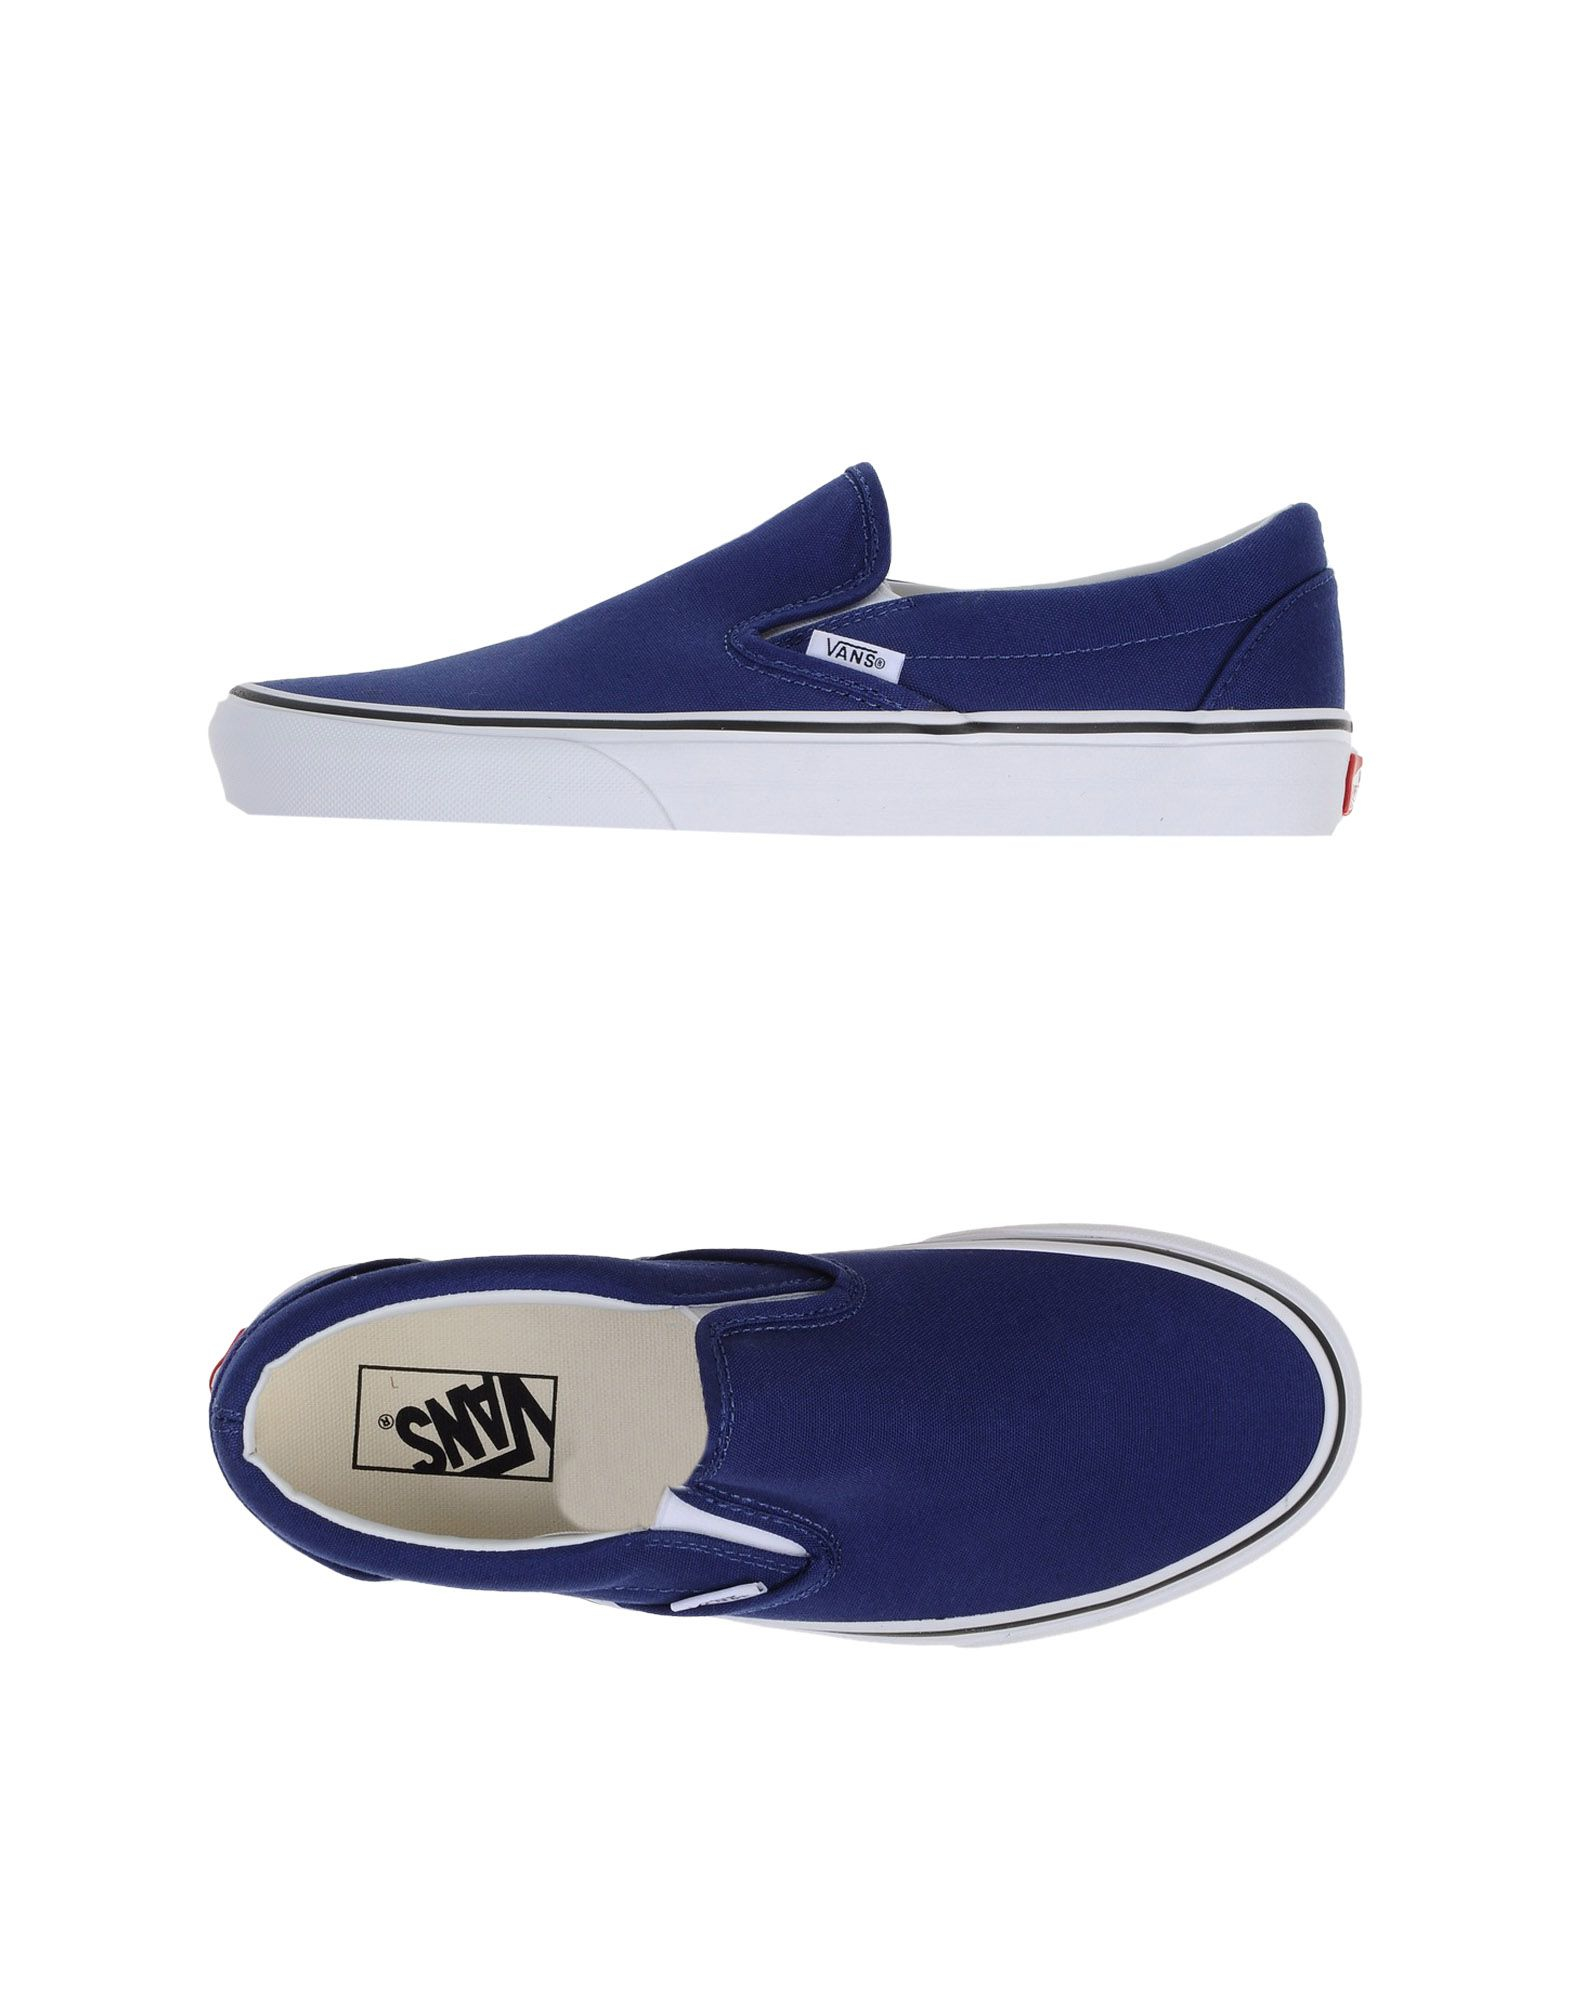 Reebok Low Top Shoes